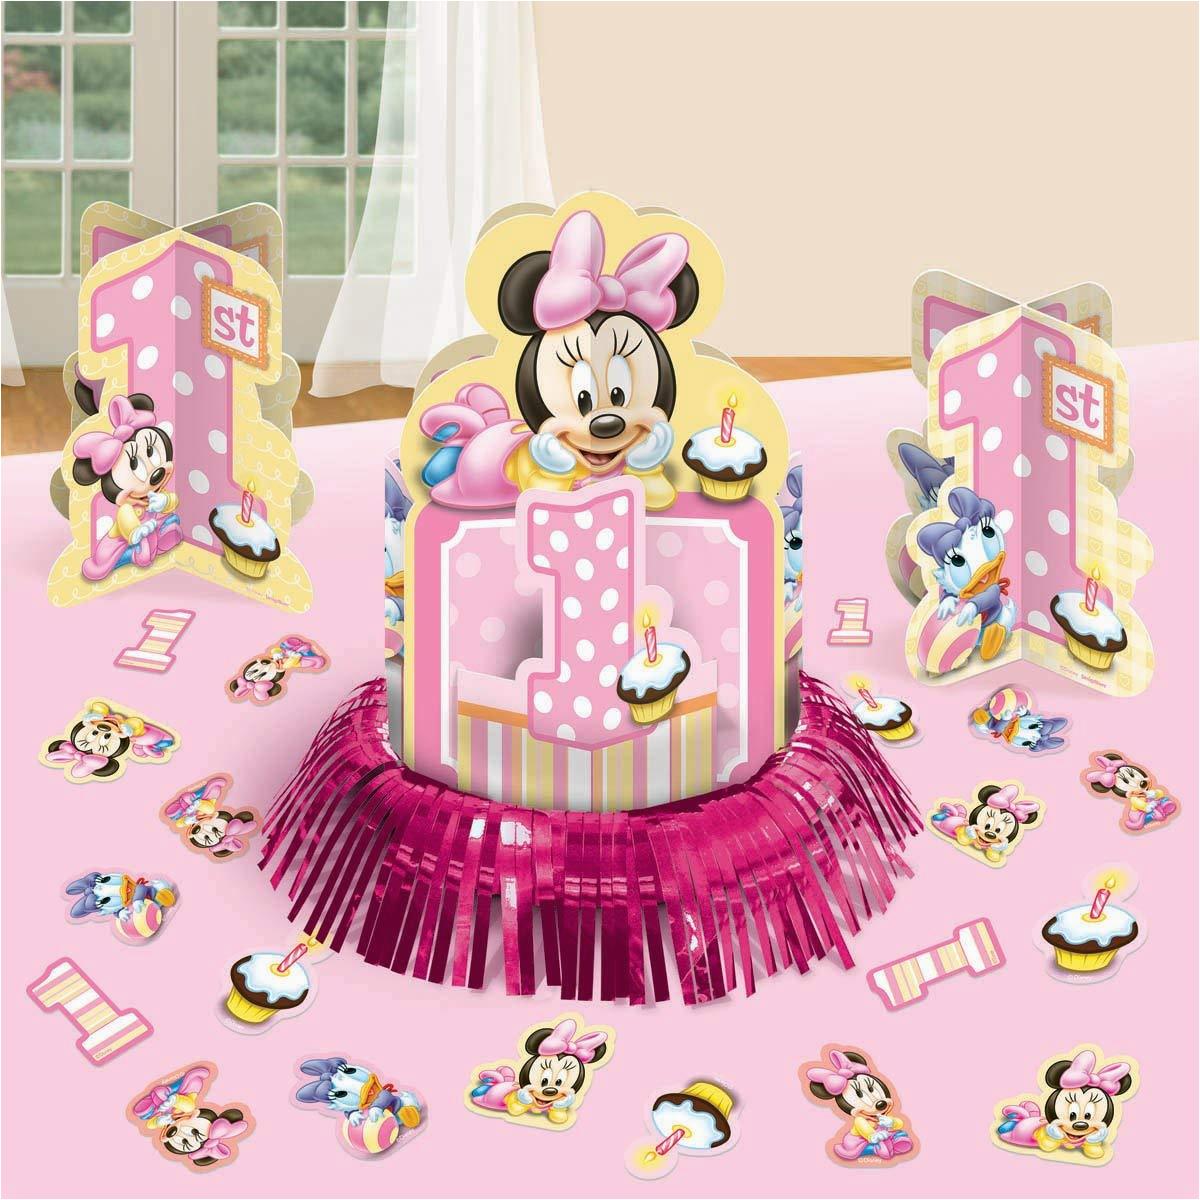 Baby Minnie 1st Birthday Decorations Baby Minnie Mouse Decorations Best Baby Decoration